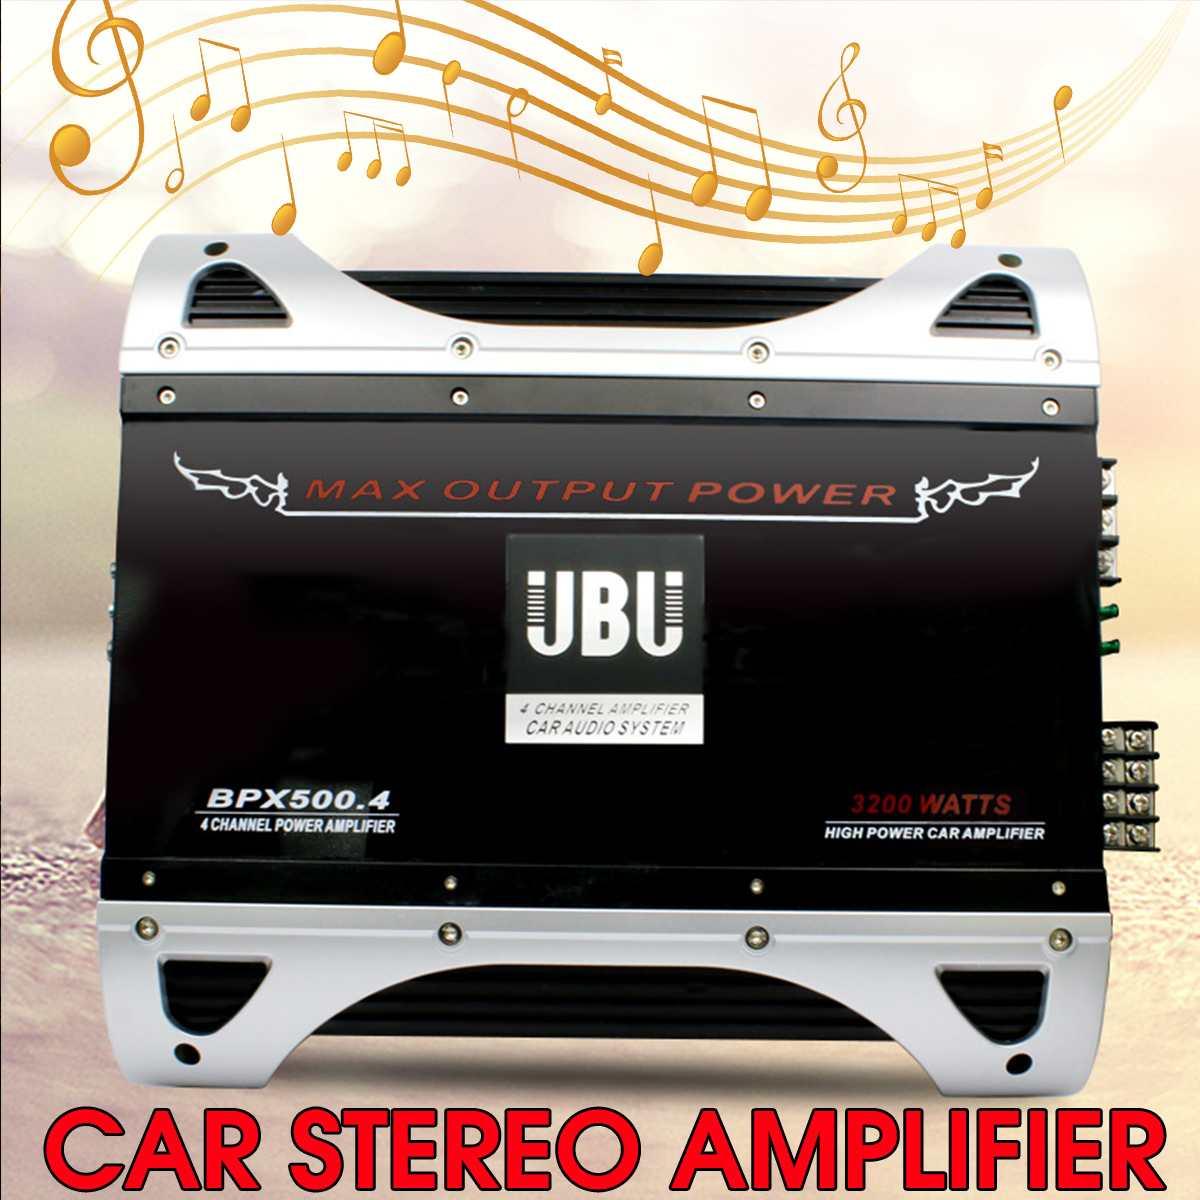 12V 4 Kanal 3200WAmp Auto Stereo HIFI Sound Verstärker Hause Musik AMP FM Bass Power Audio Verstärker Fahrzeug subwoofer Lautsprecher